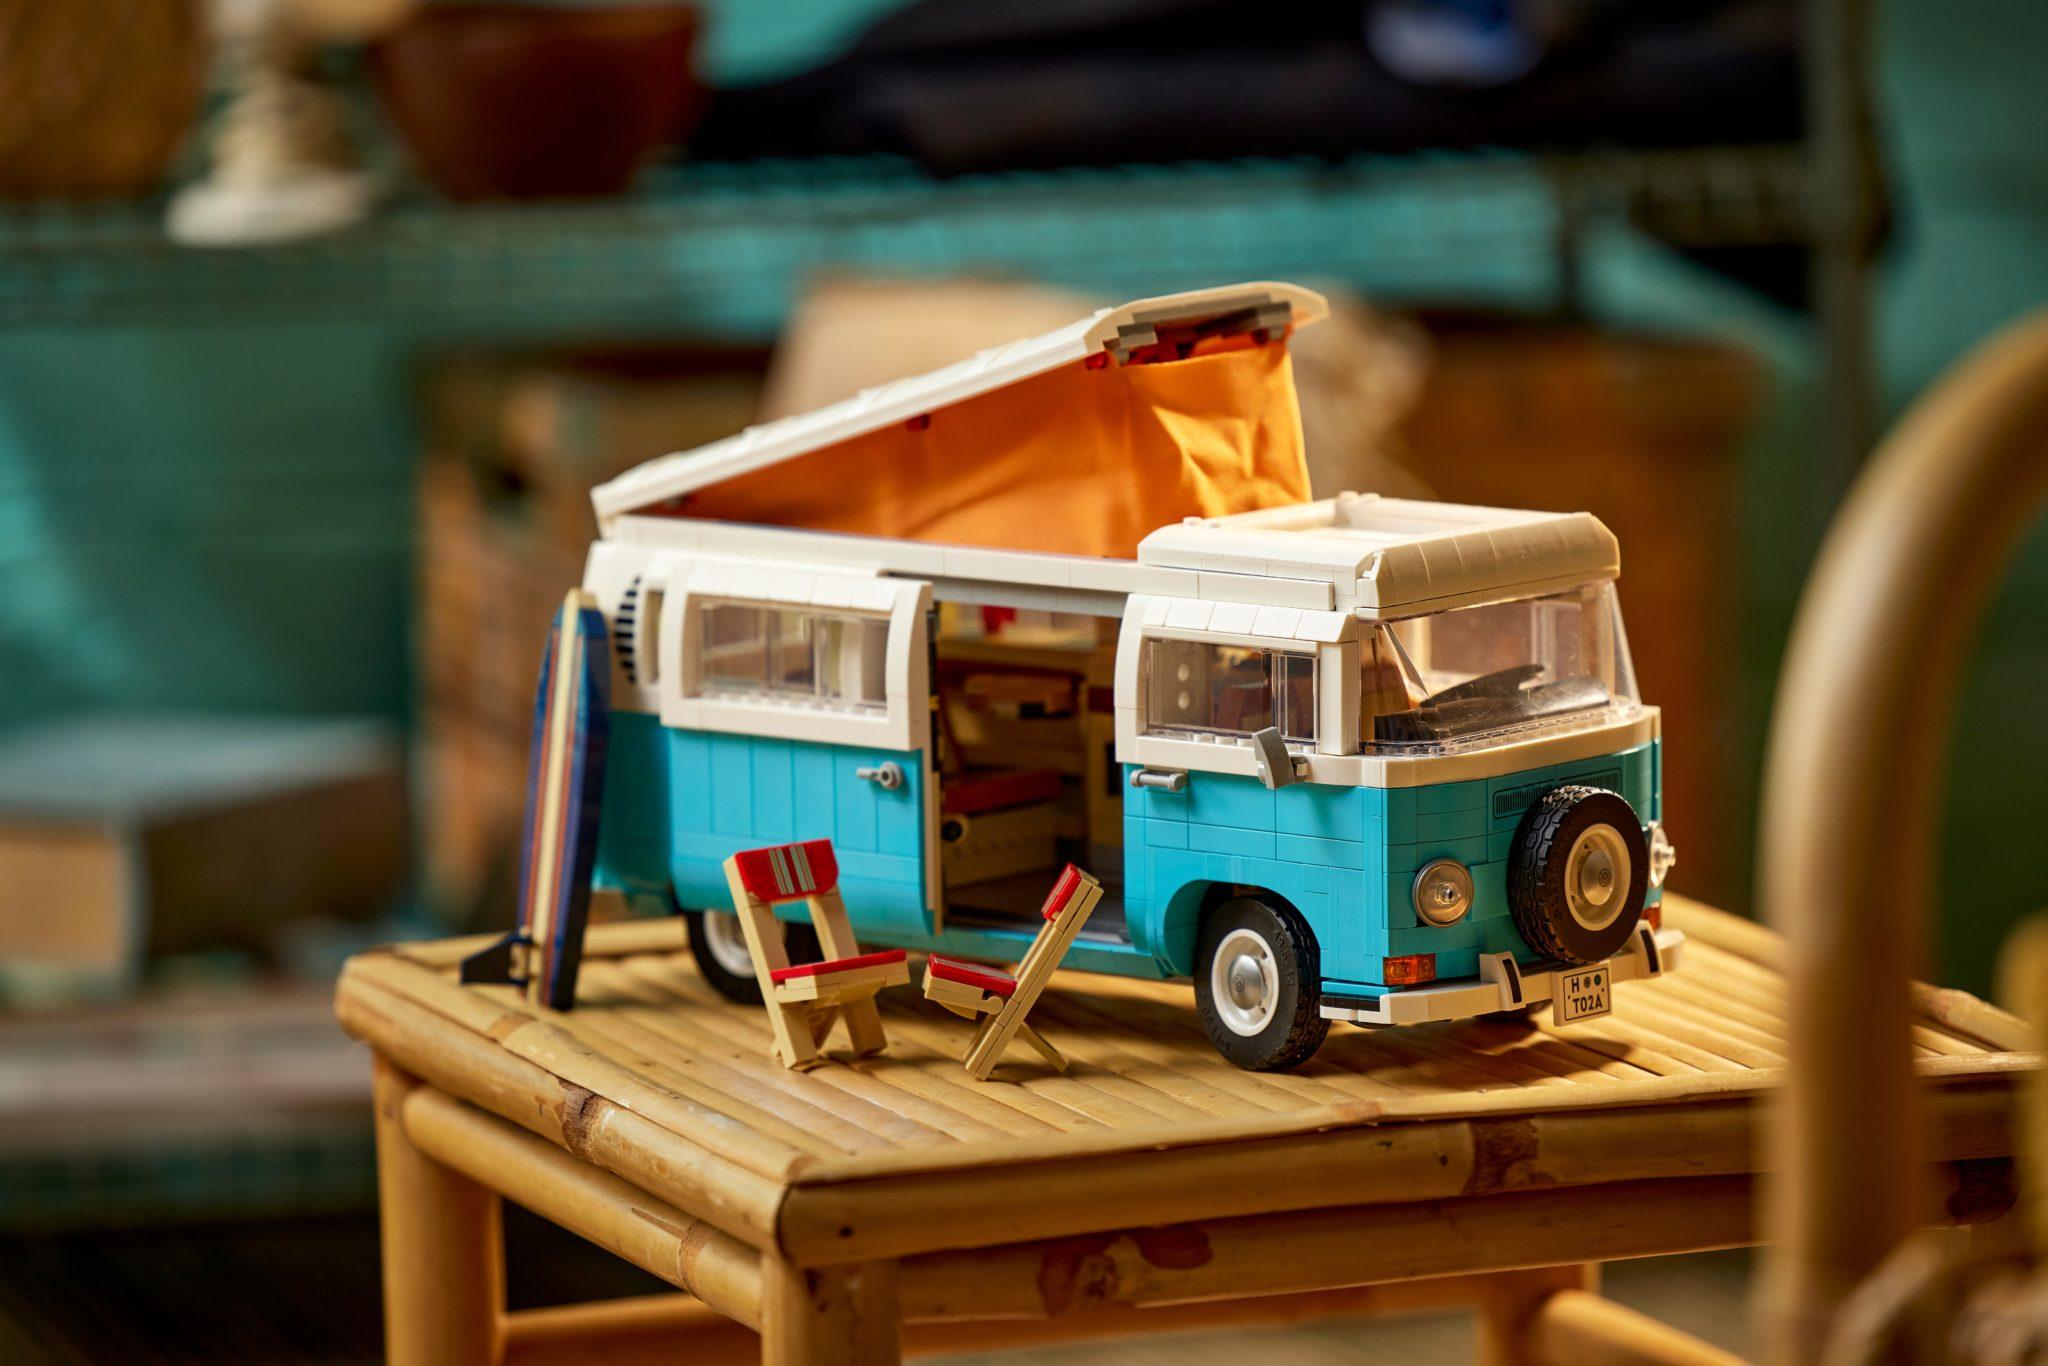 LEGO 10279 Volkswagen T2 Lifestlye